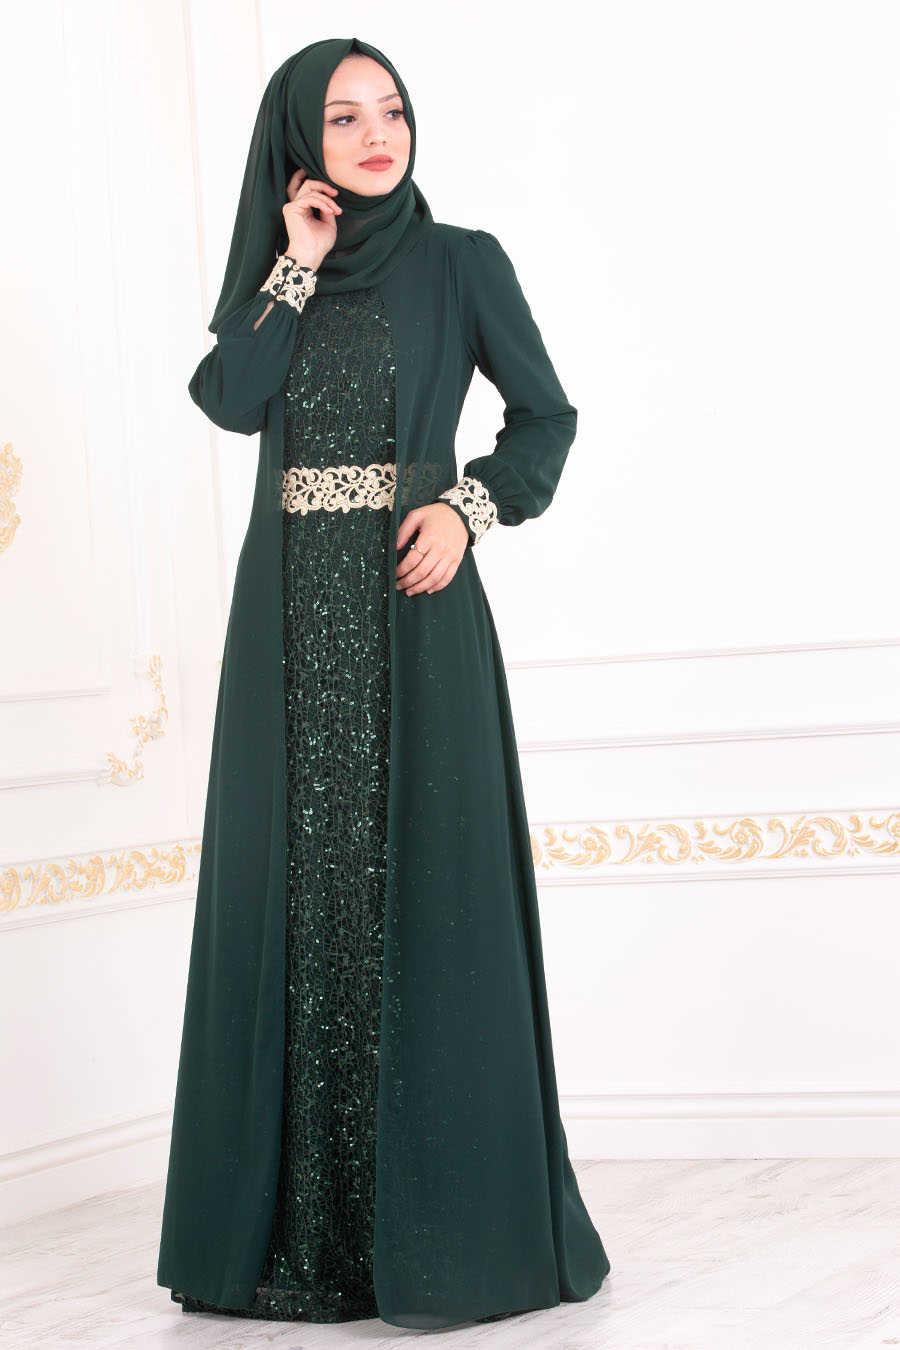 Neva Style - Green Hijab Evening Dress 25717Y